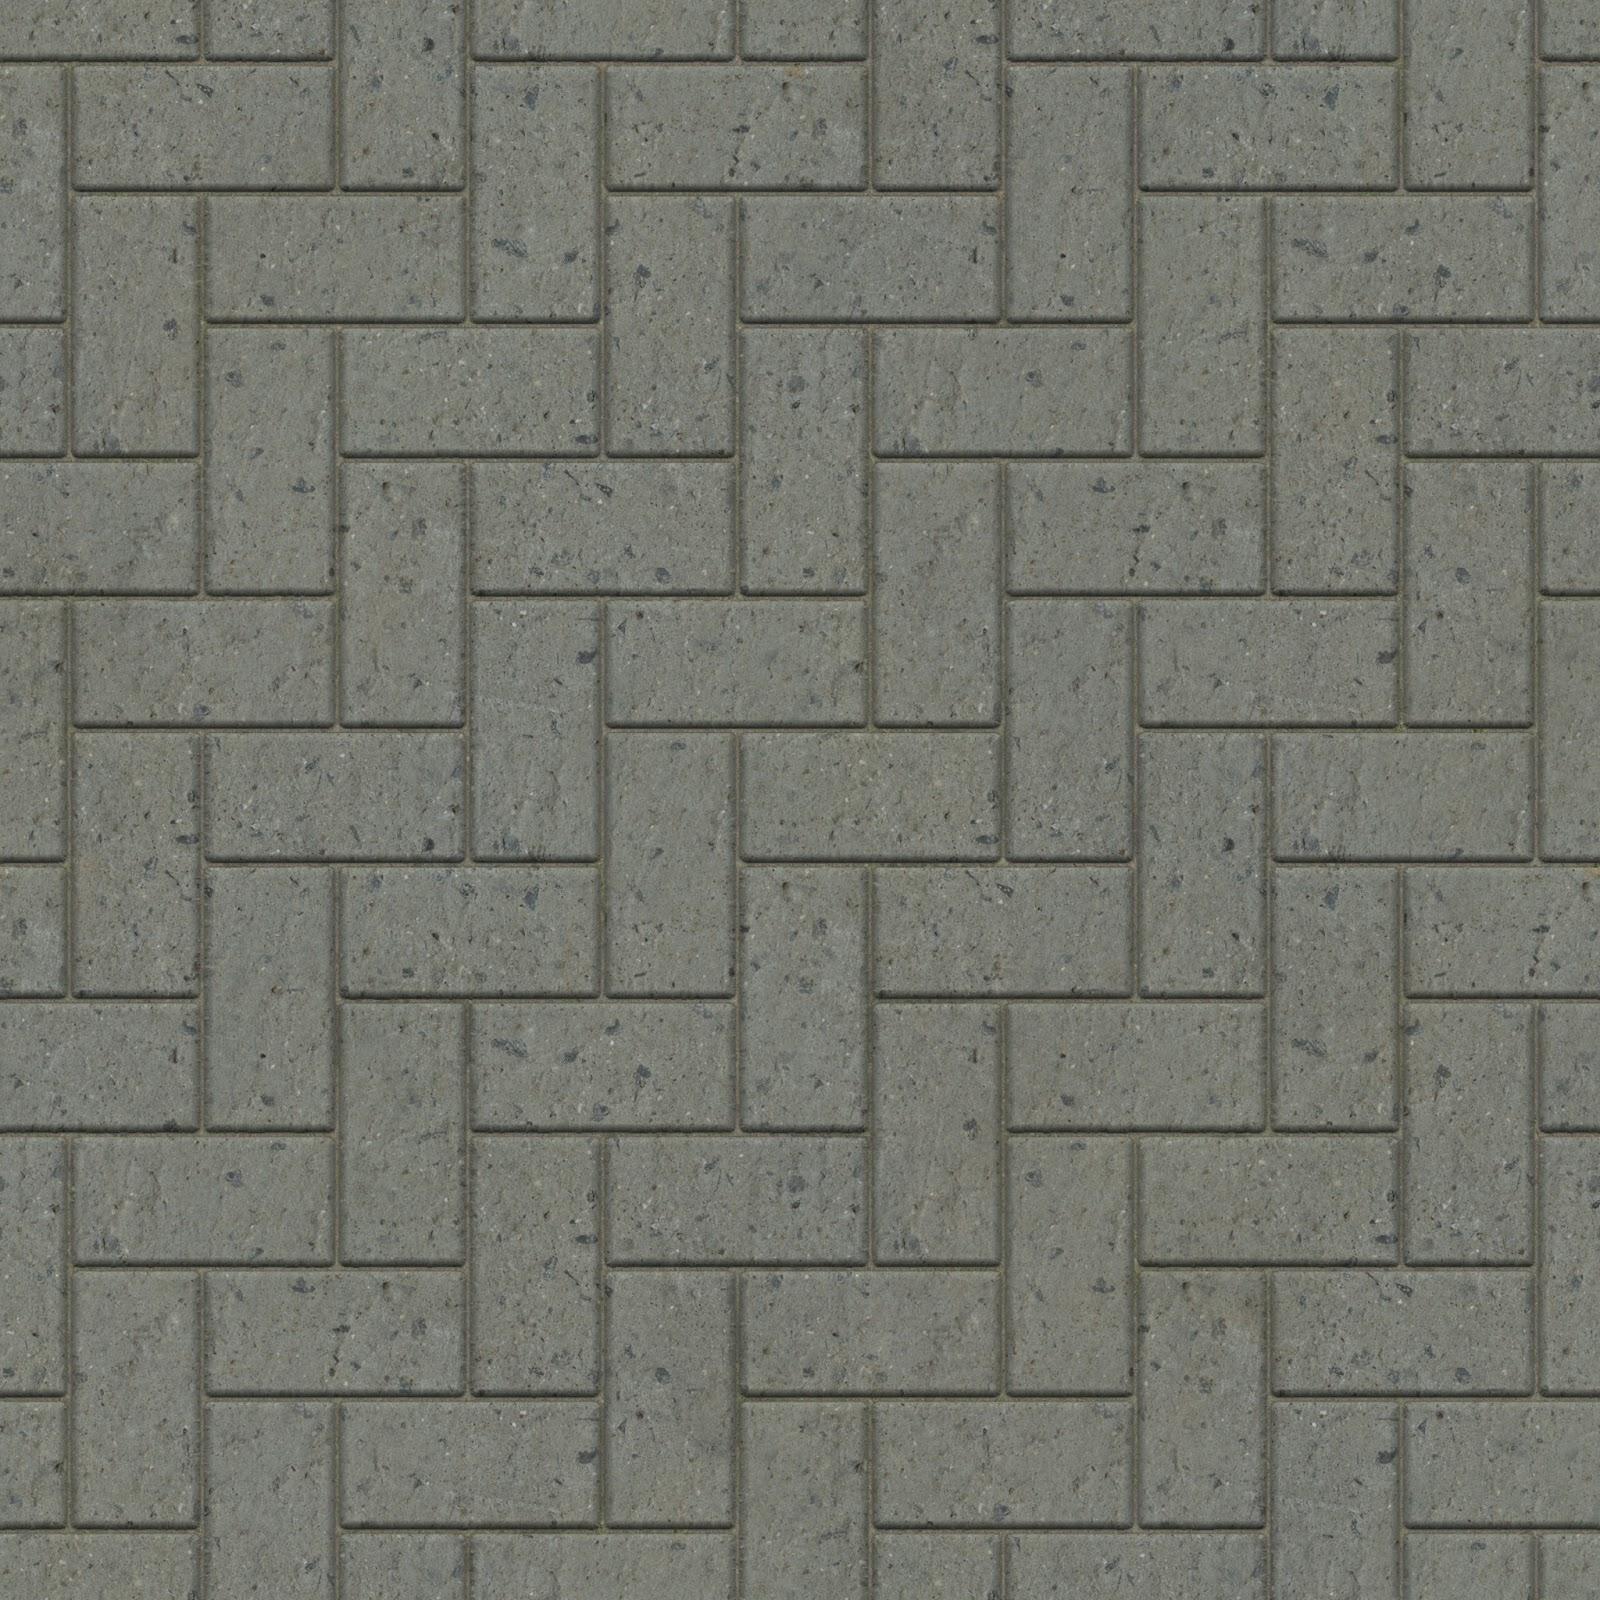 High Resolution Seamless Textures: Brick tiles pavement seamless ...